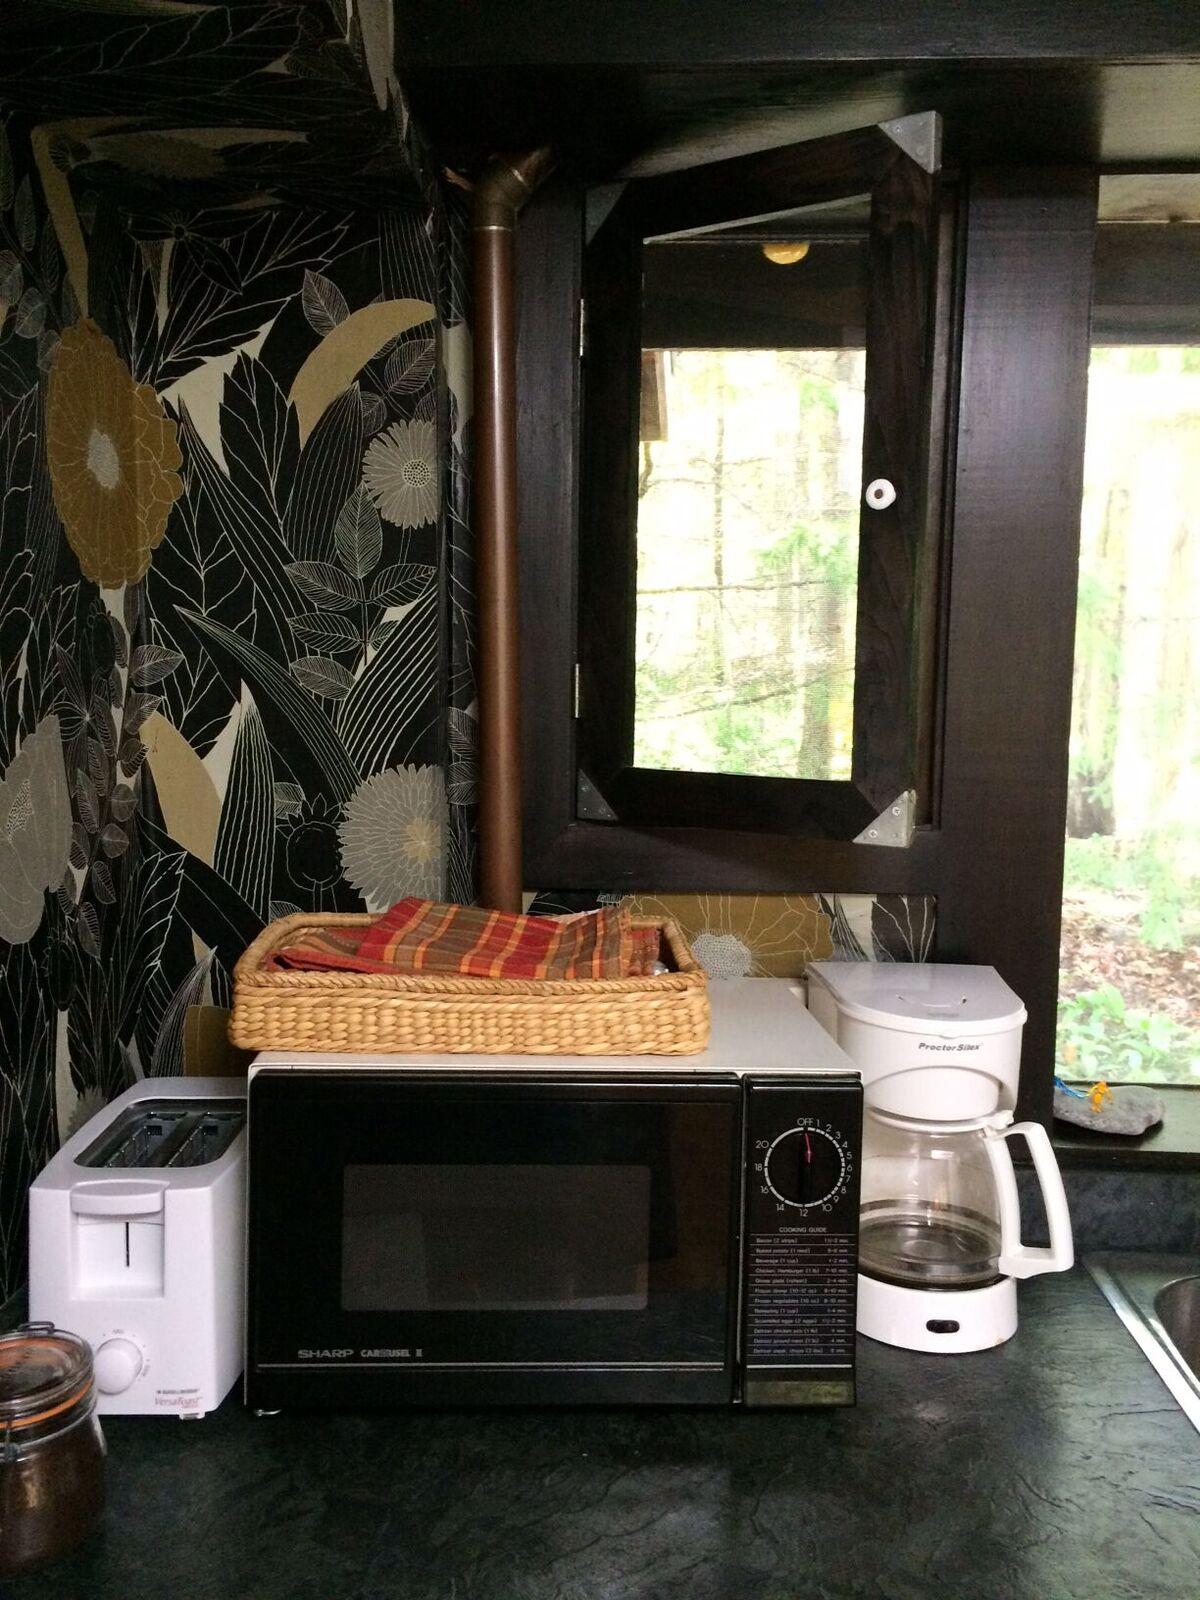 StoneHouse kitchen 1.JPG